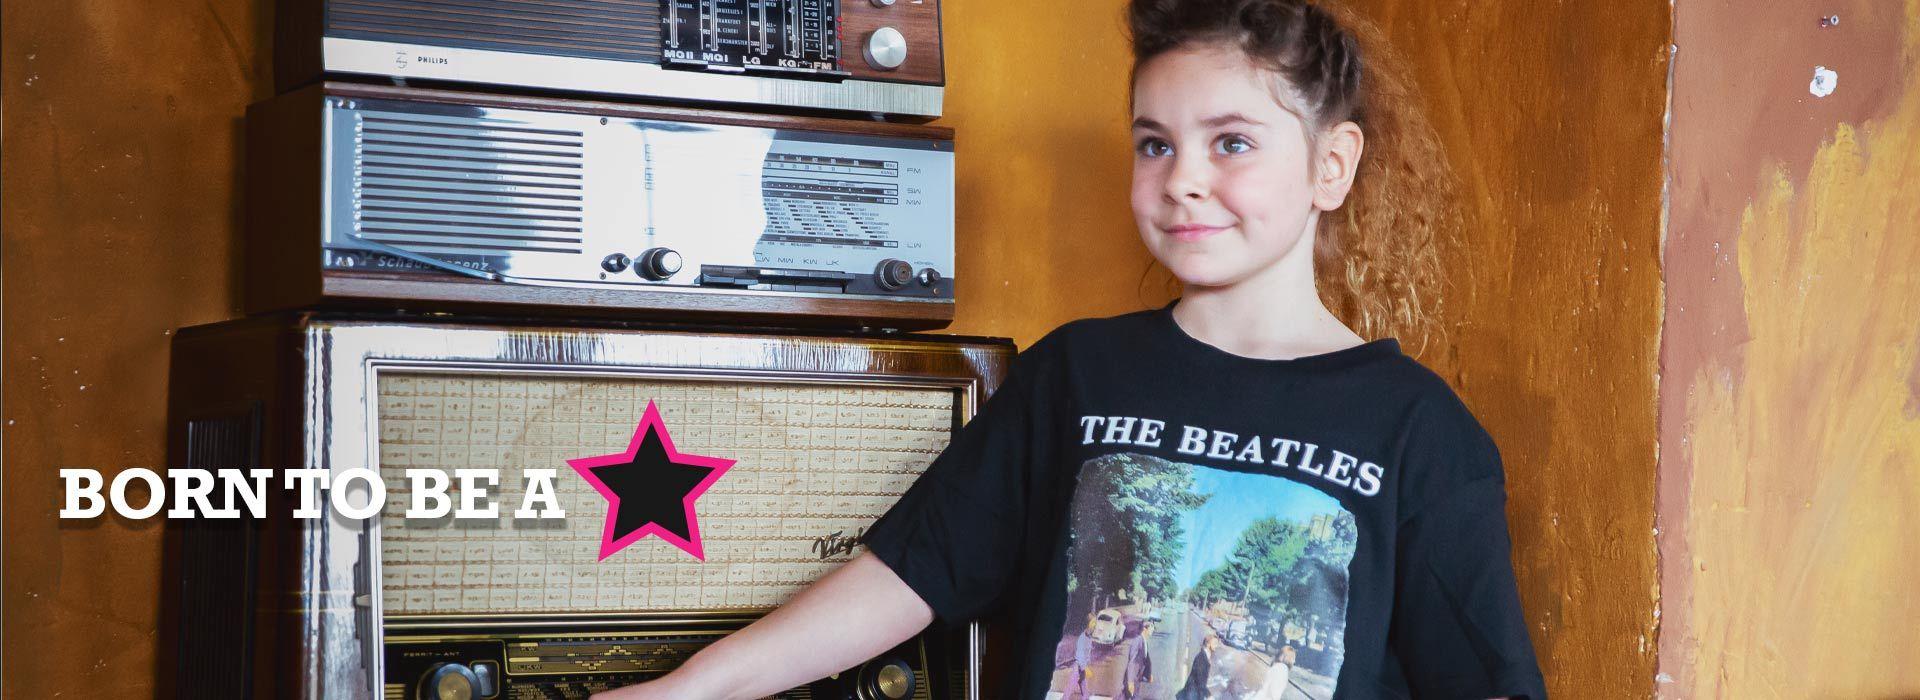 Rock Kids clothes - The Beatles Abbey Road T-shirt